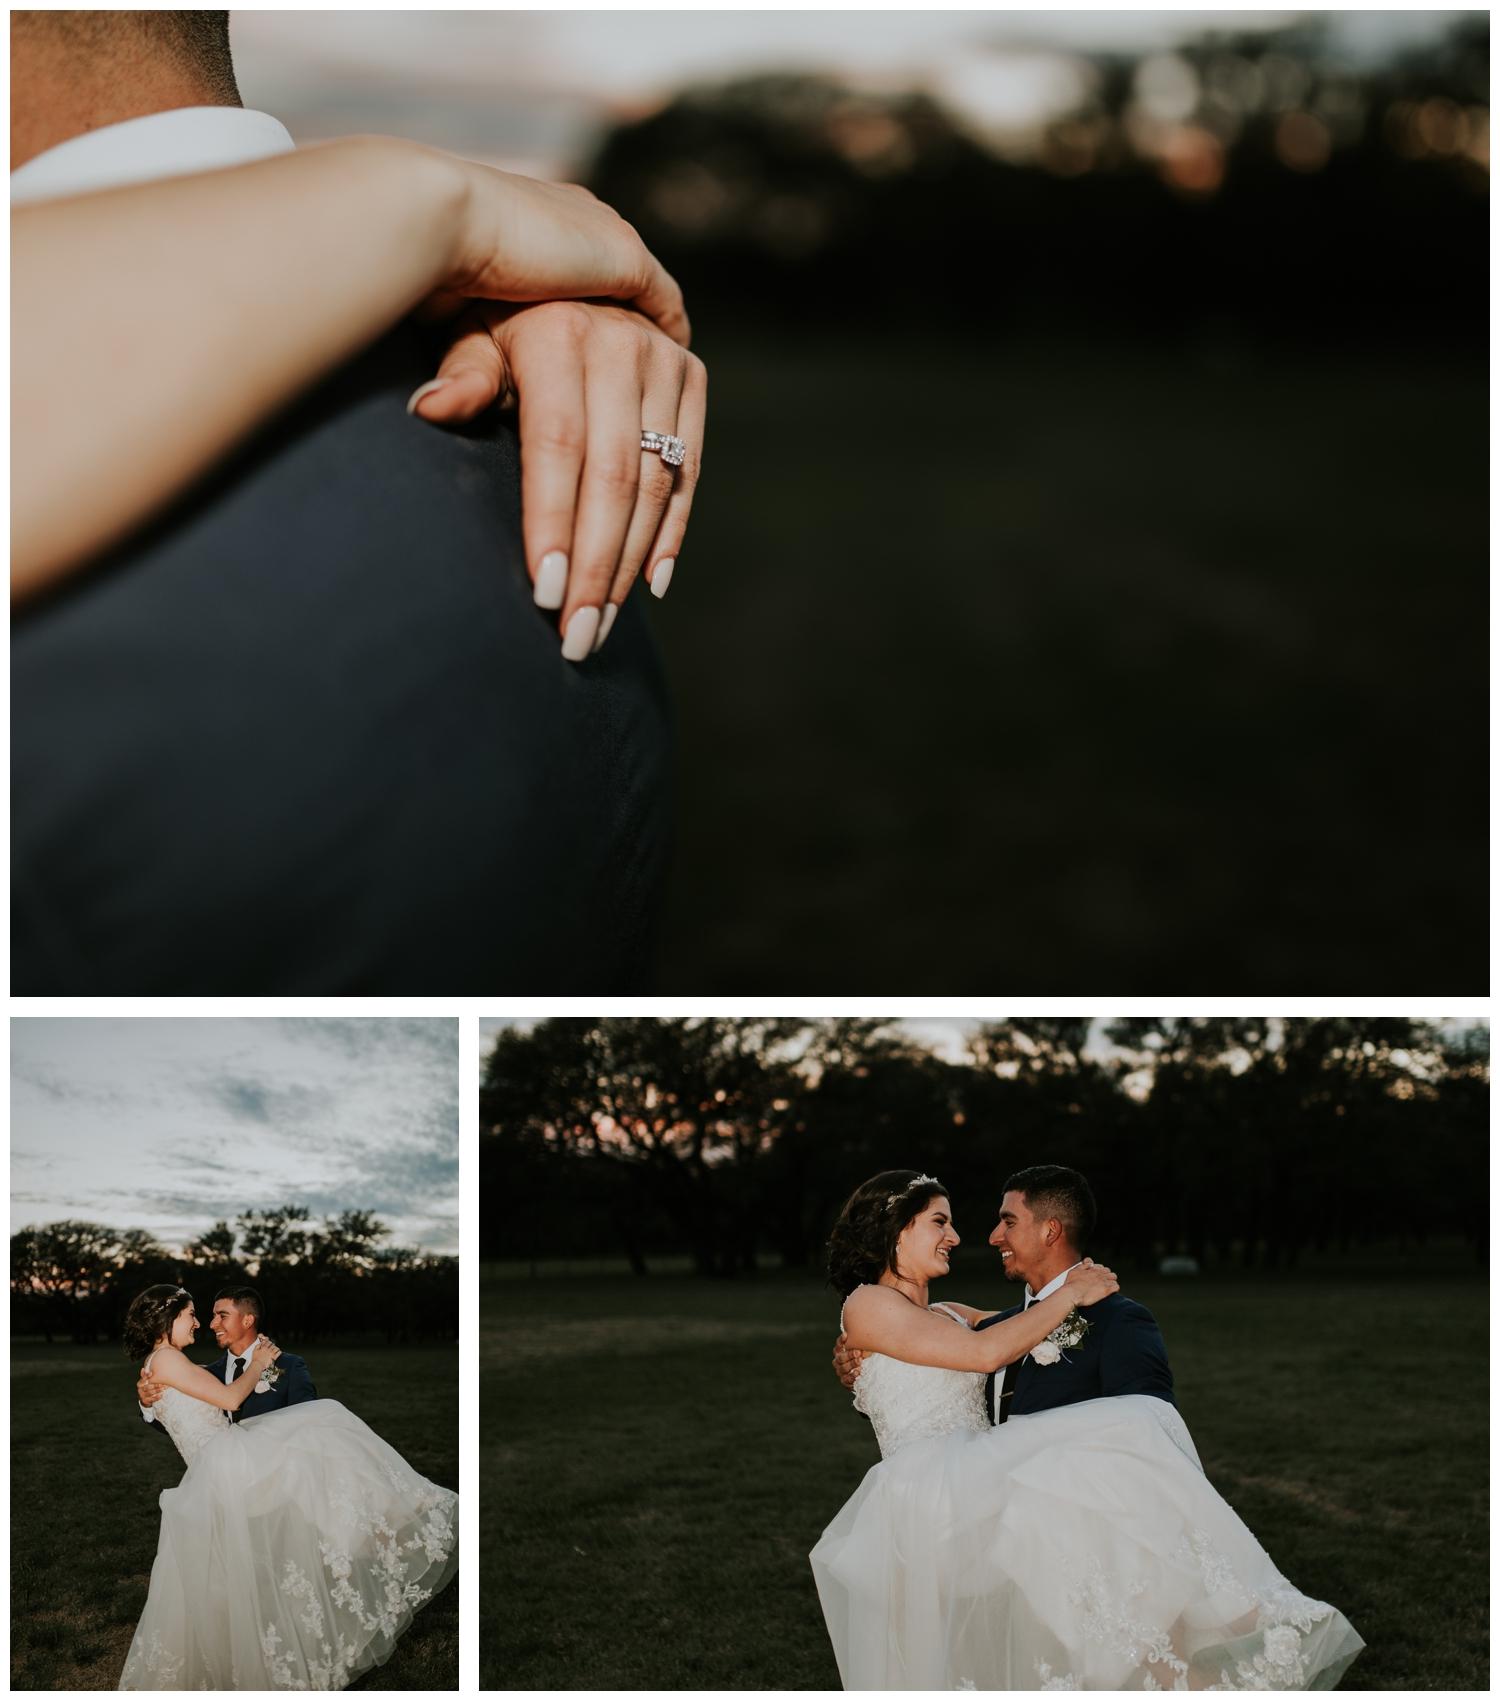 Ashlee+Mike, Featherstone Ranch Spring Wedding, San Antonio, Contista Productions Wedding Photography_0104.jpg